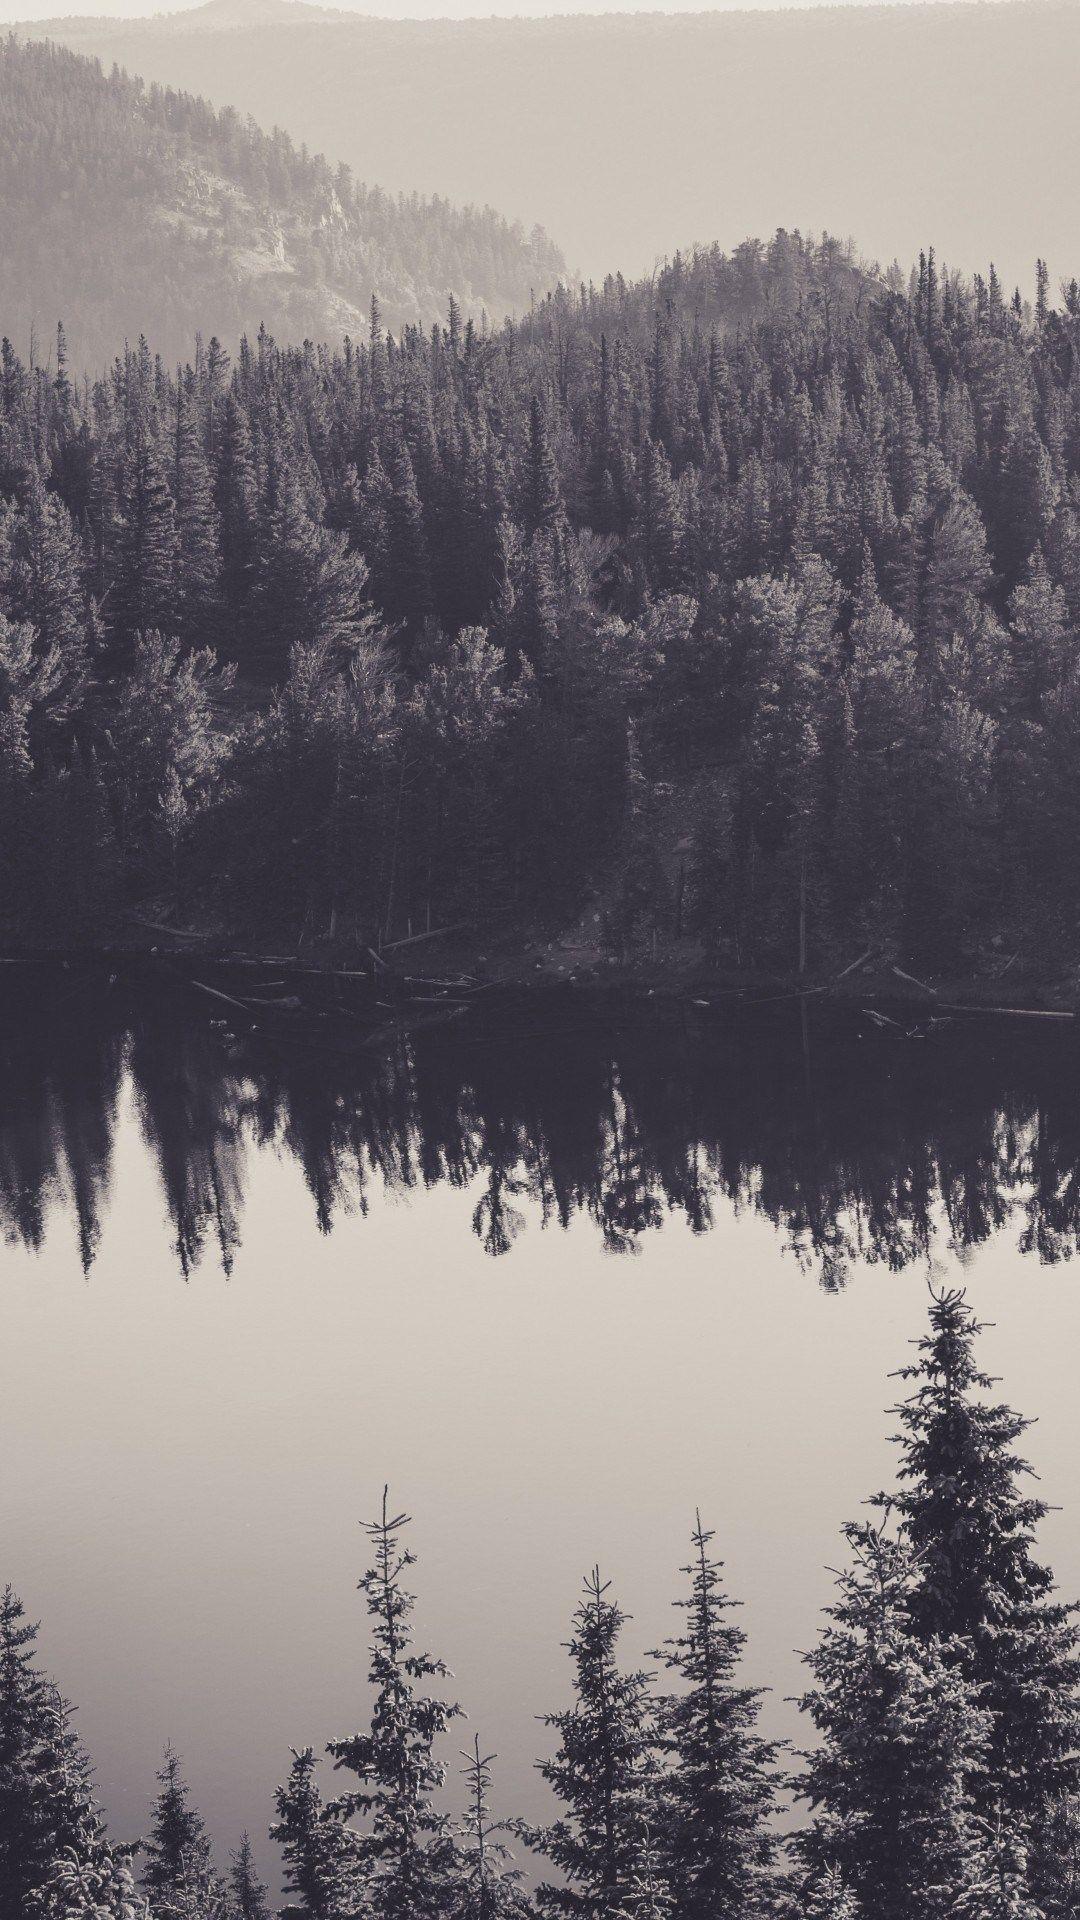 Dark Wallpaper 4k Black And White Iphone Photos Nature